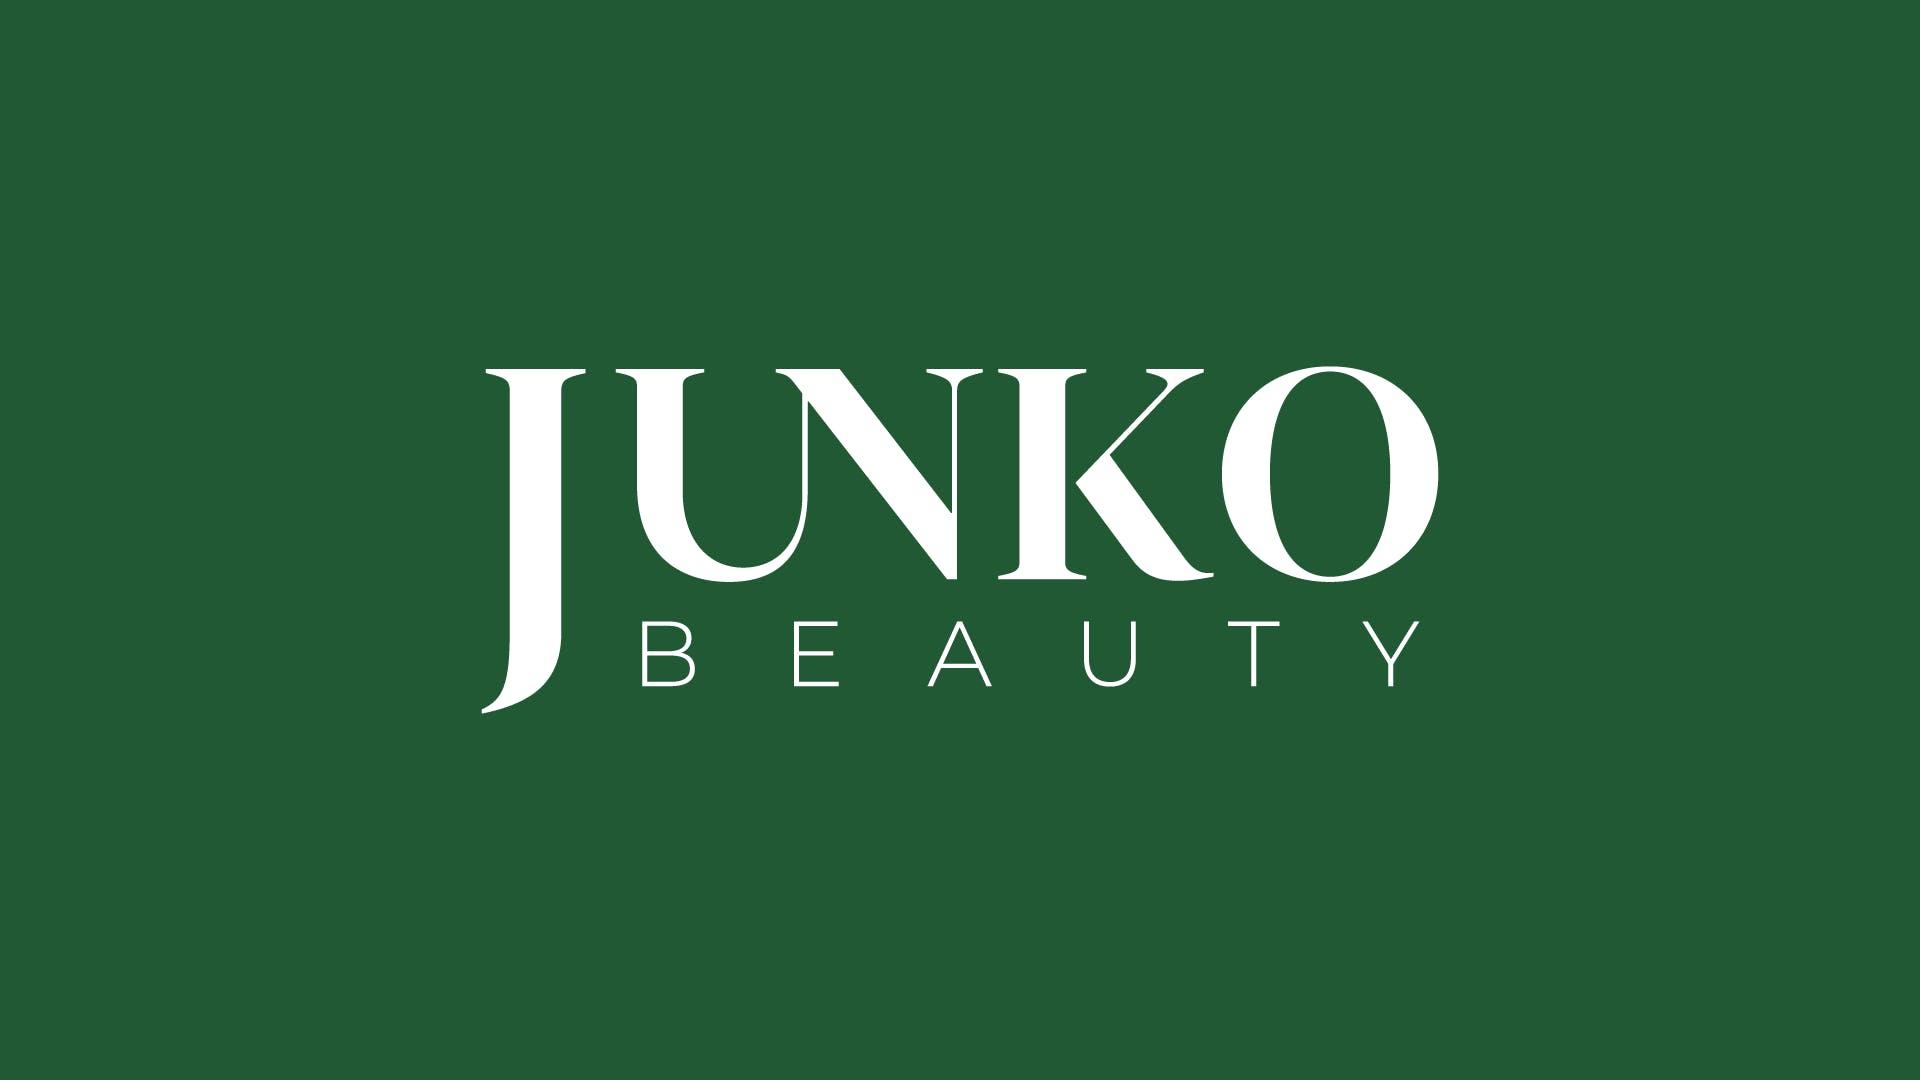 Junko Beauty - Design de logo de clínicas de estética